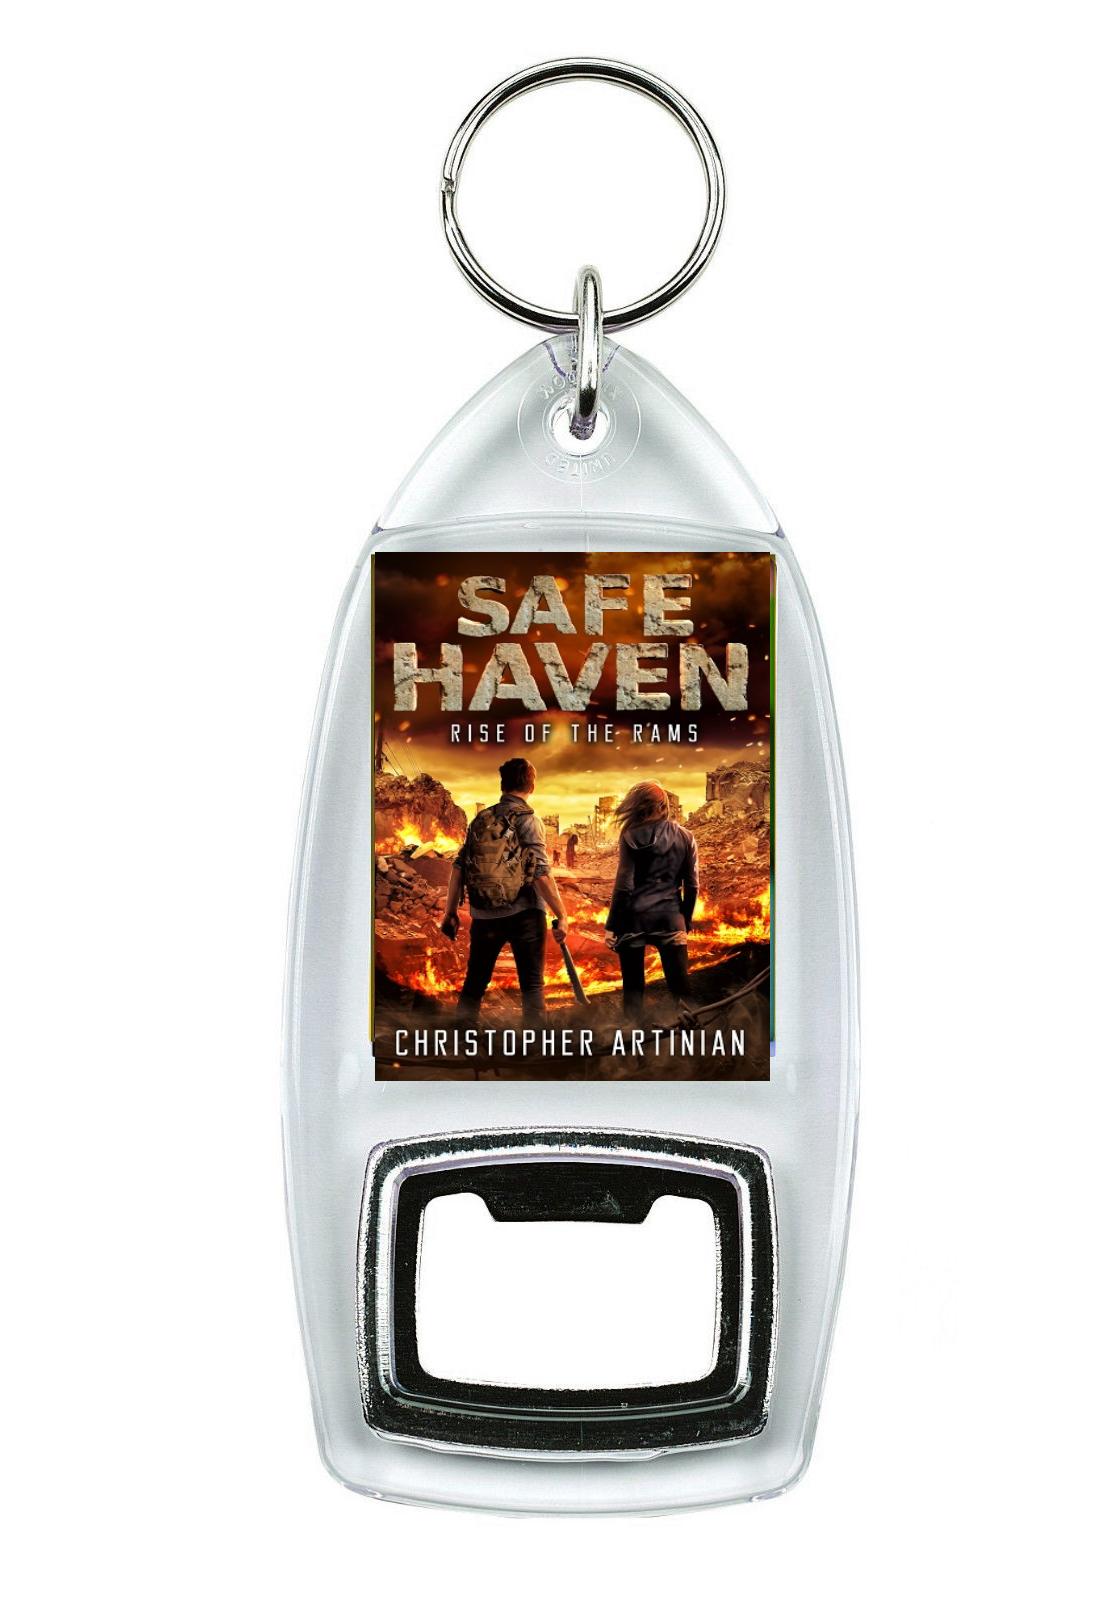 SAFE HAVEN: RISE OF THE RAMS (NEW DESIGN) (BOTTLE OPENER KEYRING)